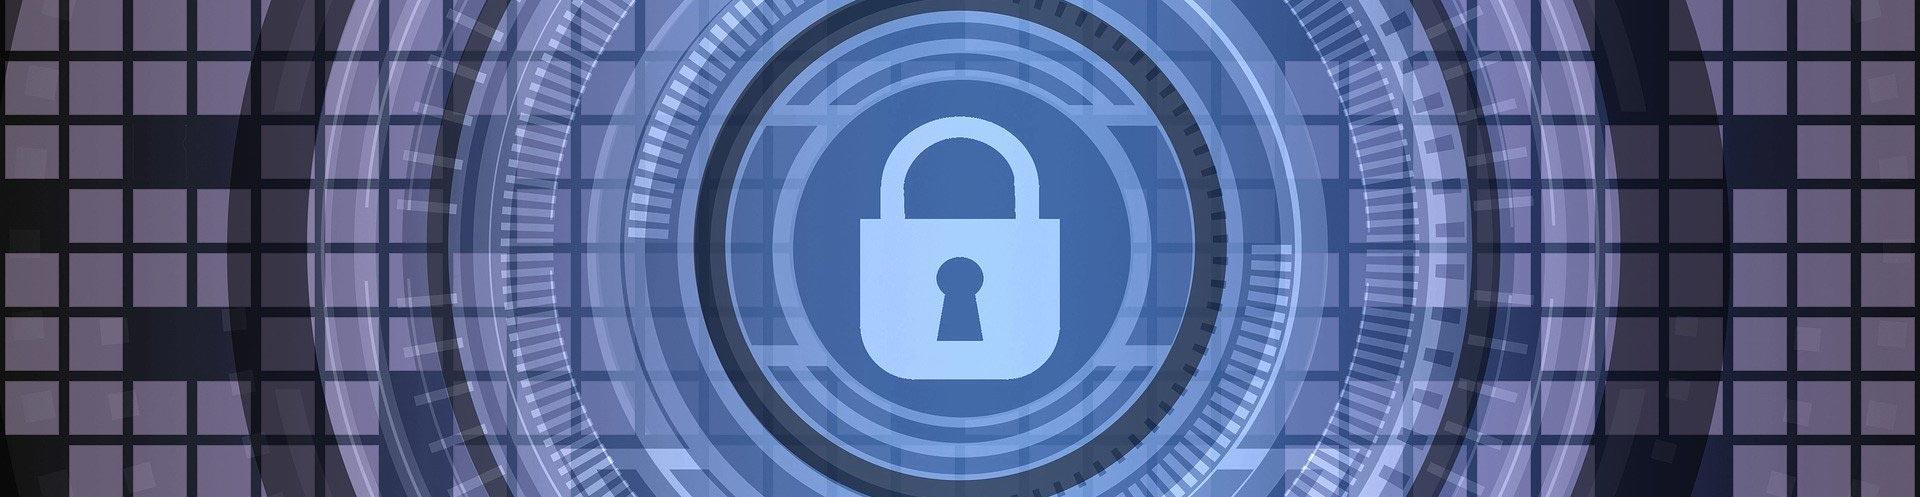 KSU Offers New Cybersecurity Degree